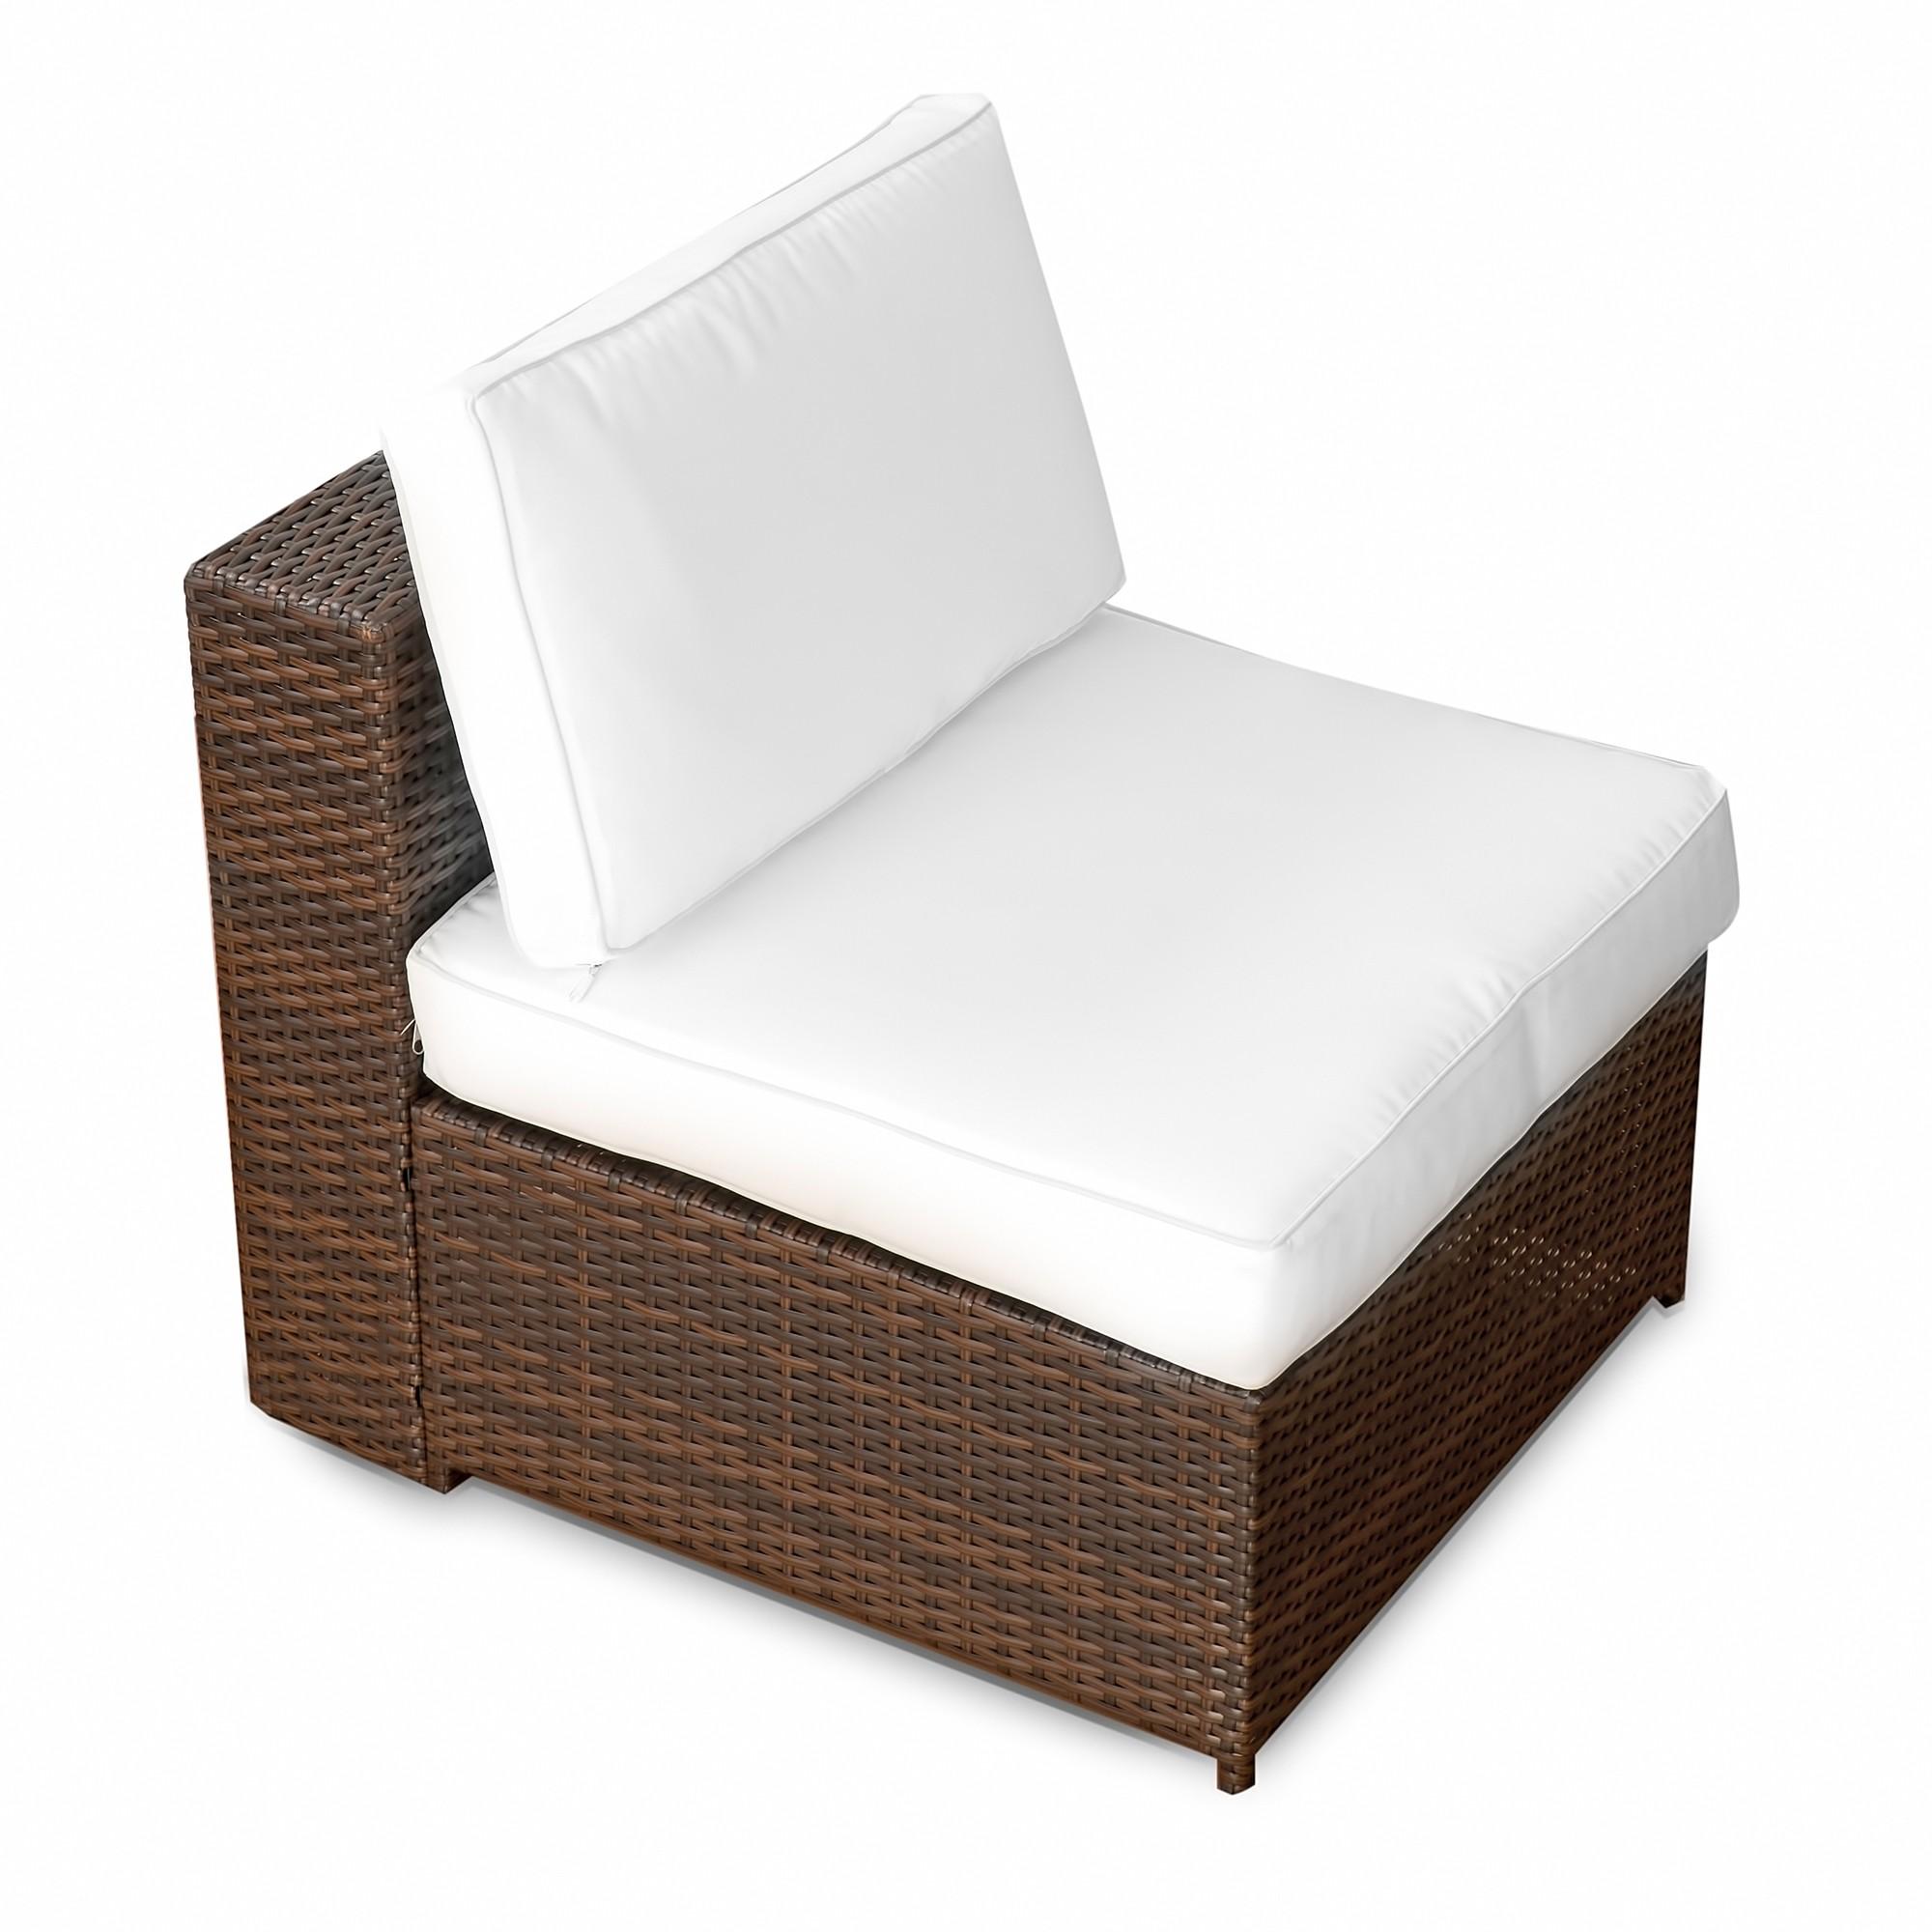 Lounge sessel polyrattan braun  Lounge Sessel Garten ▻ günstig ◅ Garten Lounge Sessel kaufen